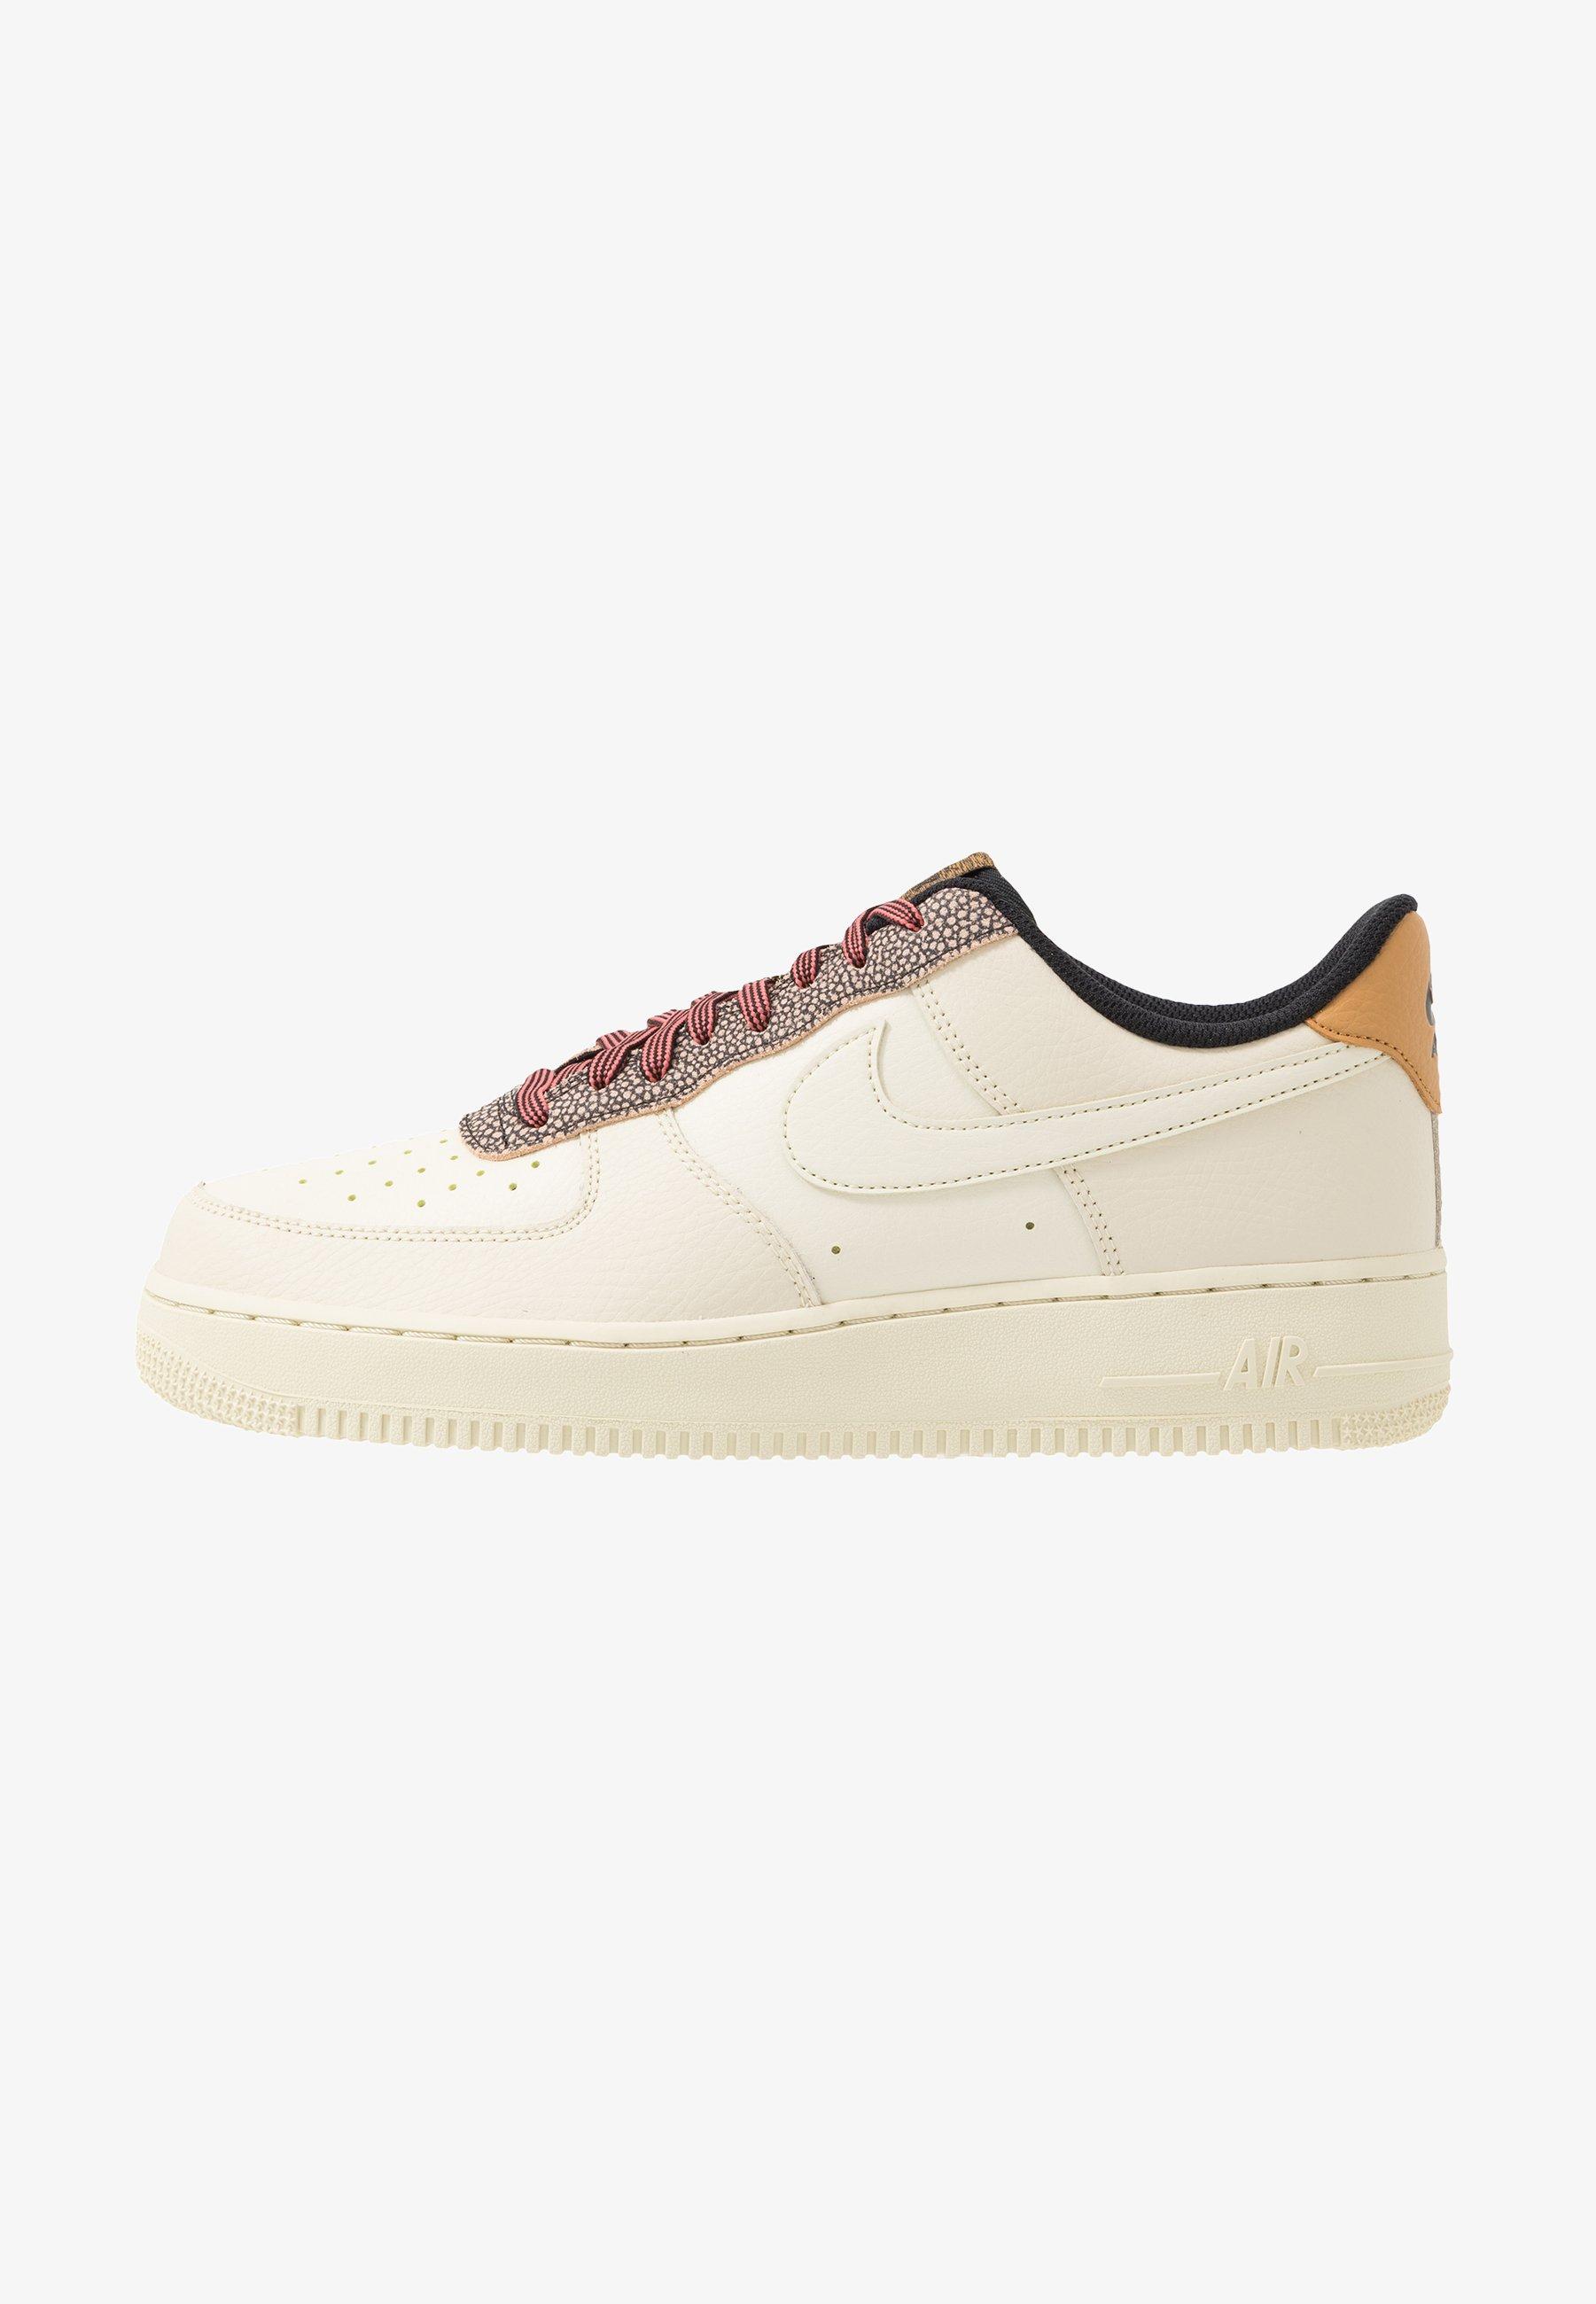 Nike Sportswear Air Force 1 07 Lv8 Trainers Wheat Shimmer Club Gold Black Beige Zalando Co Uk